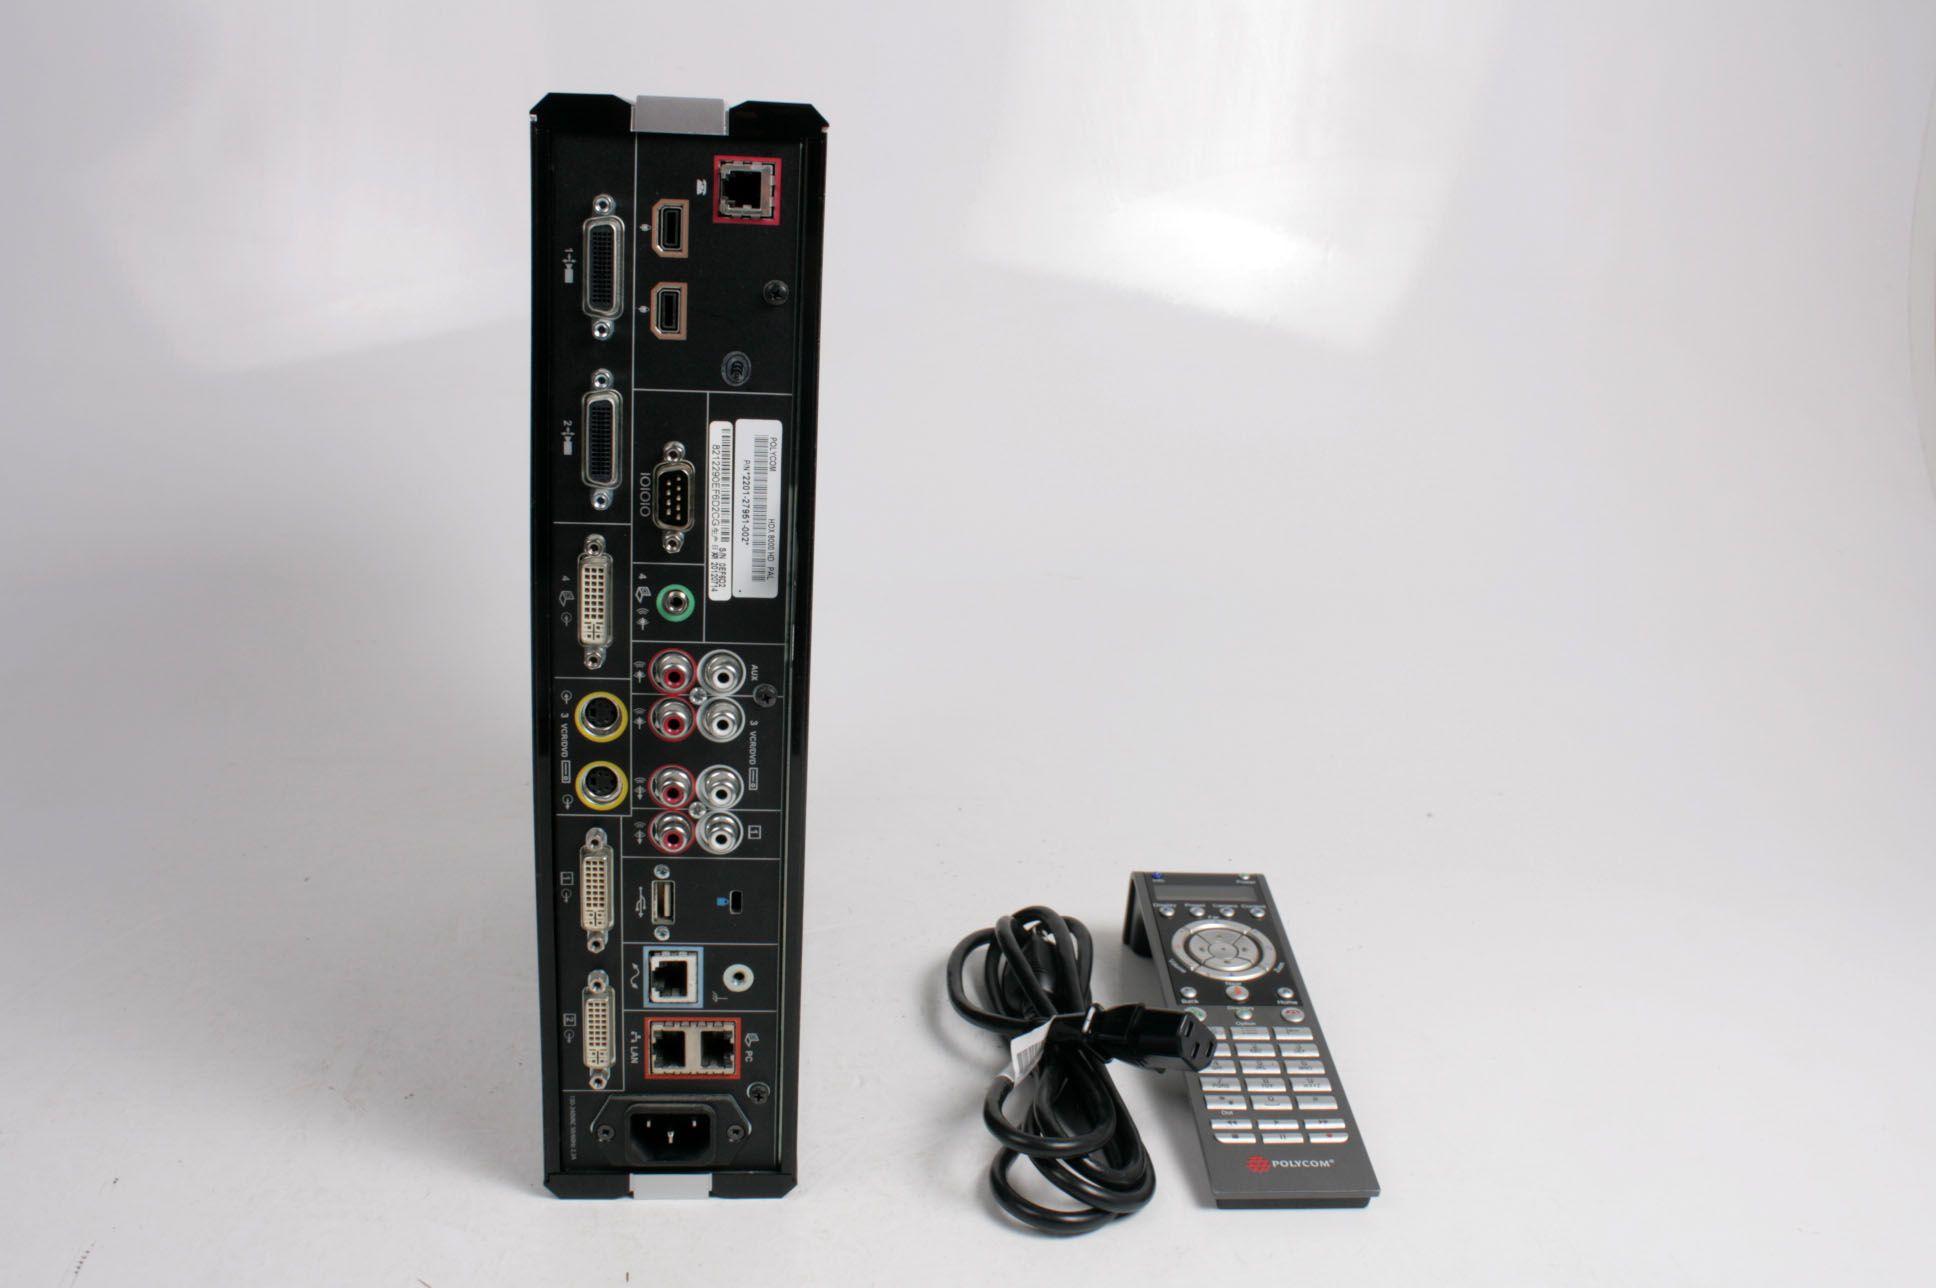 Polycom HDX 8000 HD Video Conferencing Equipment Base Unit 2201-27951-002